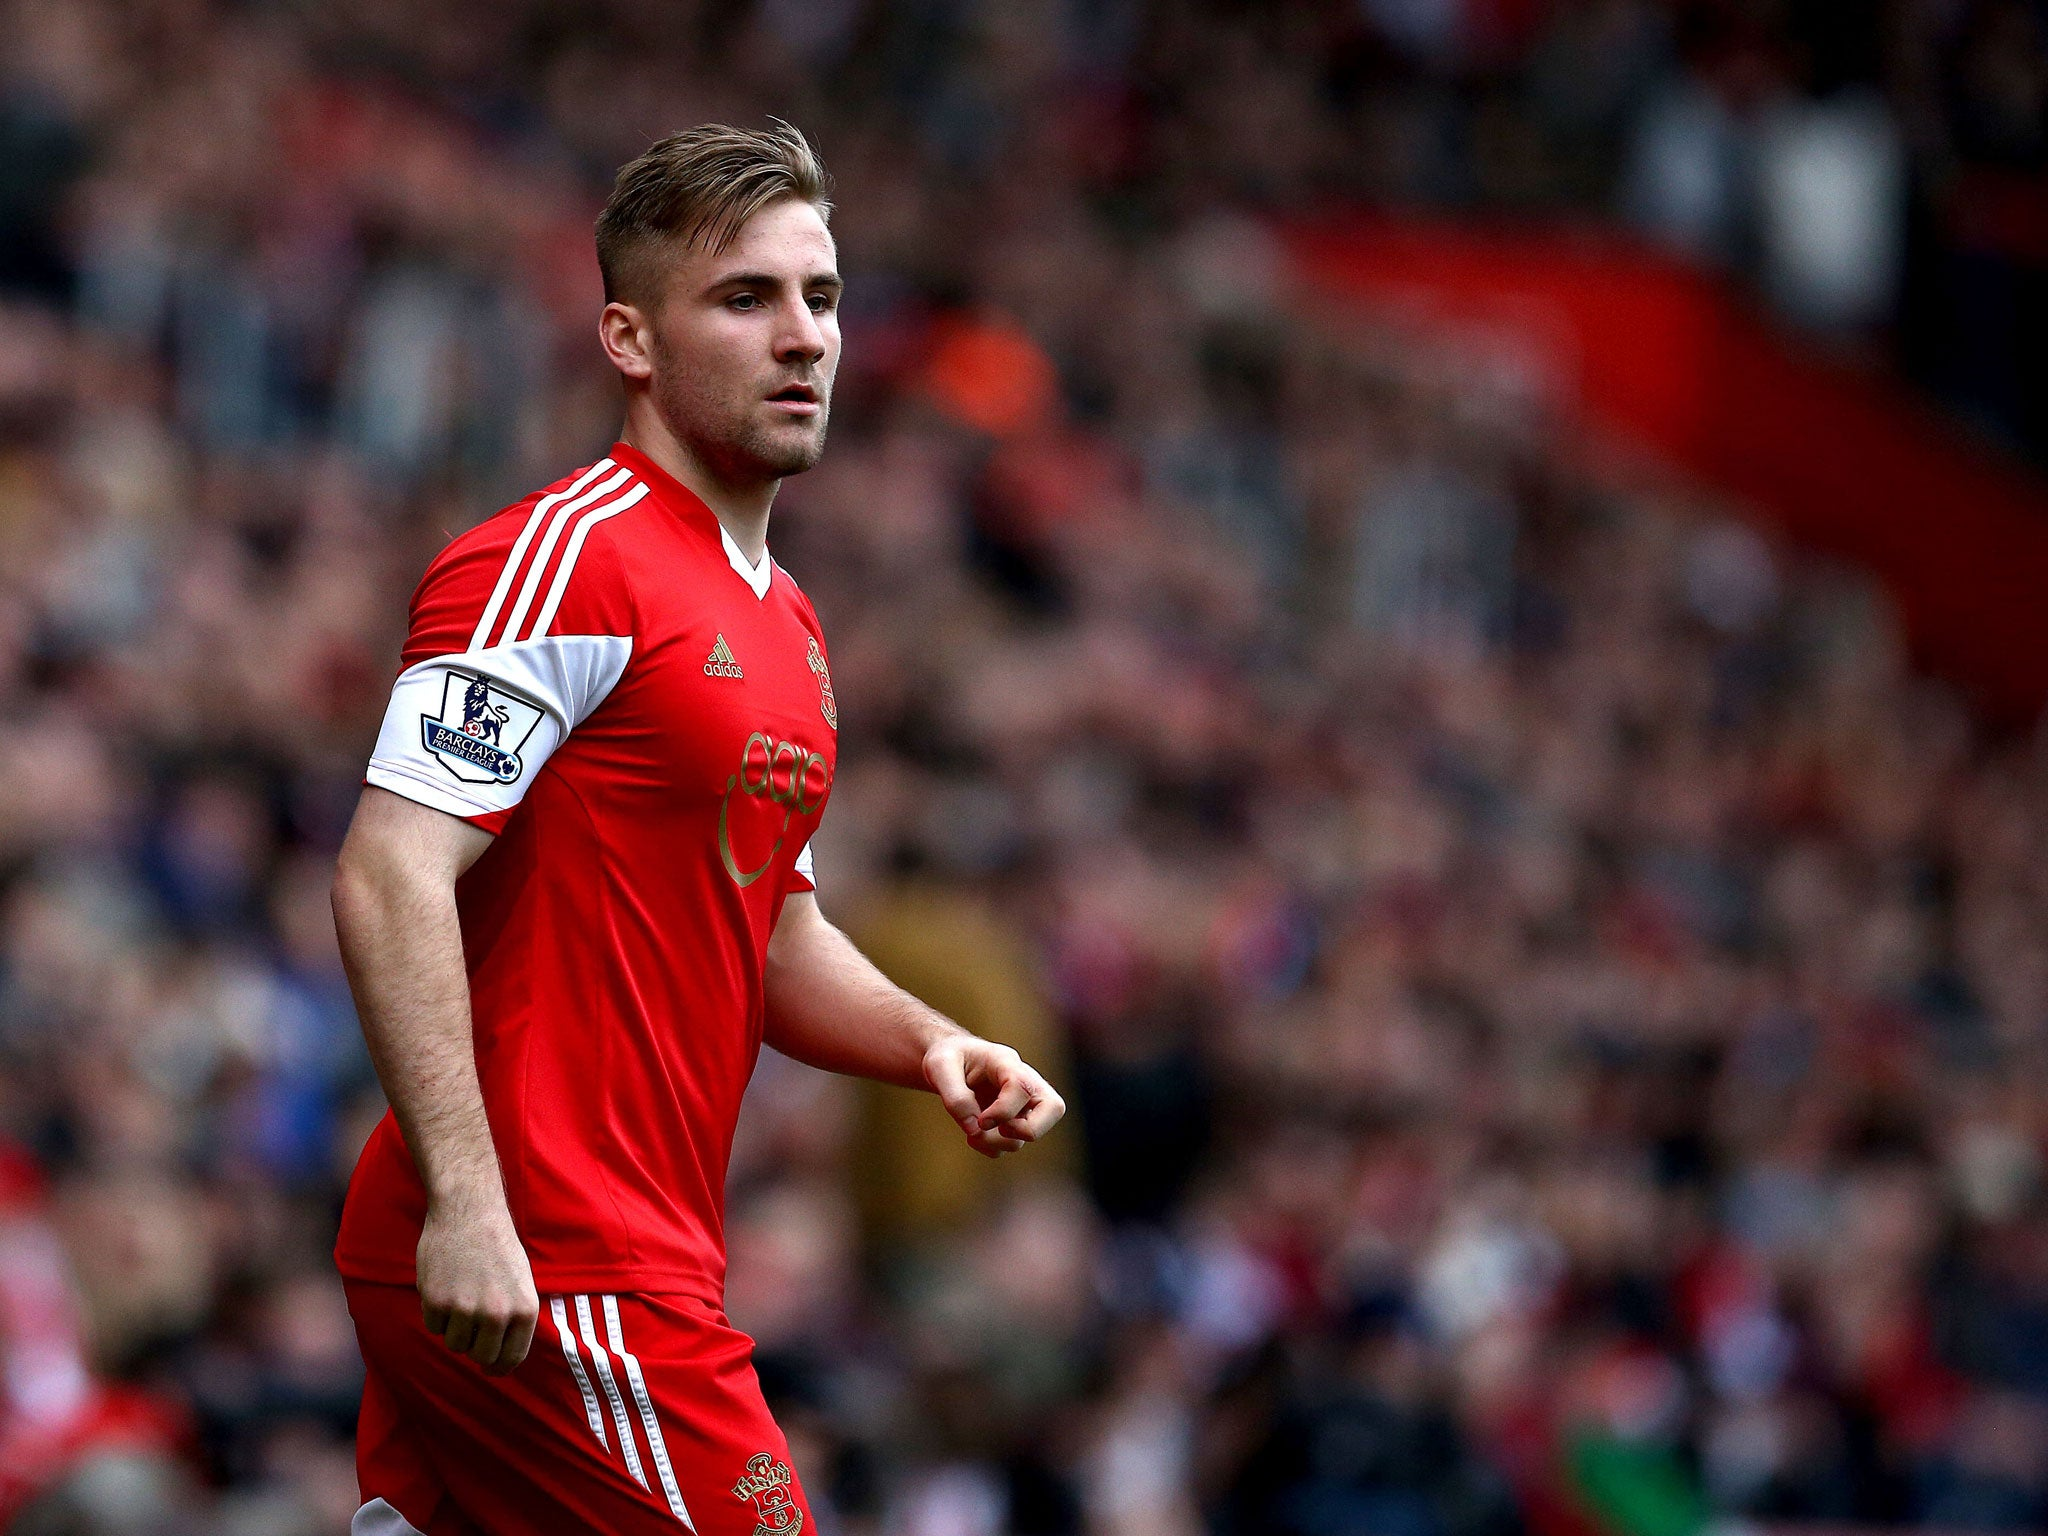 Transfer news: Southampton have 'intention' to keep Luke Shaw